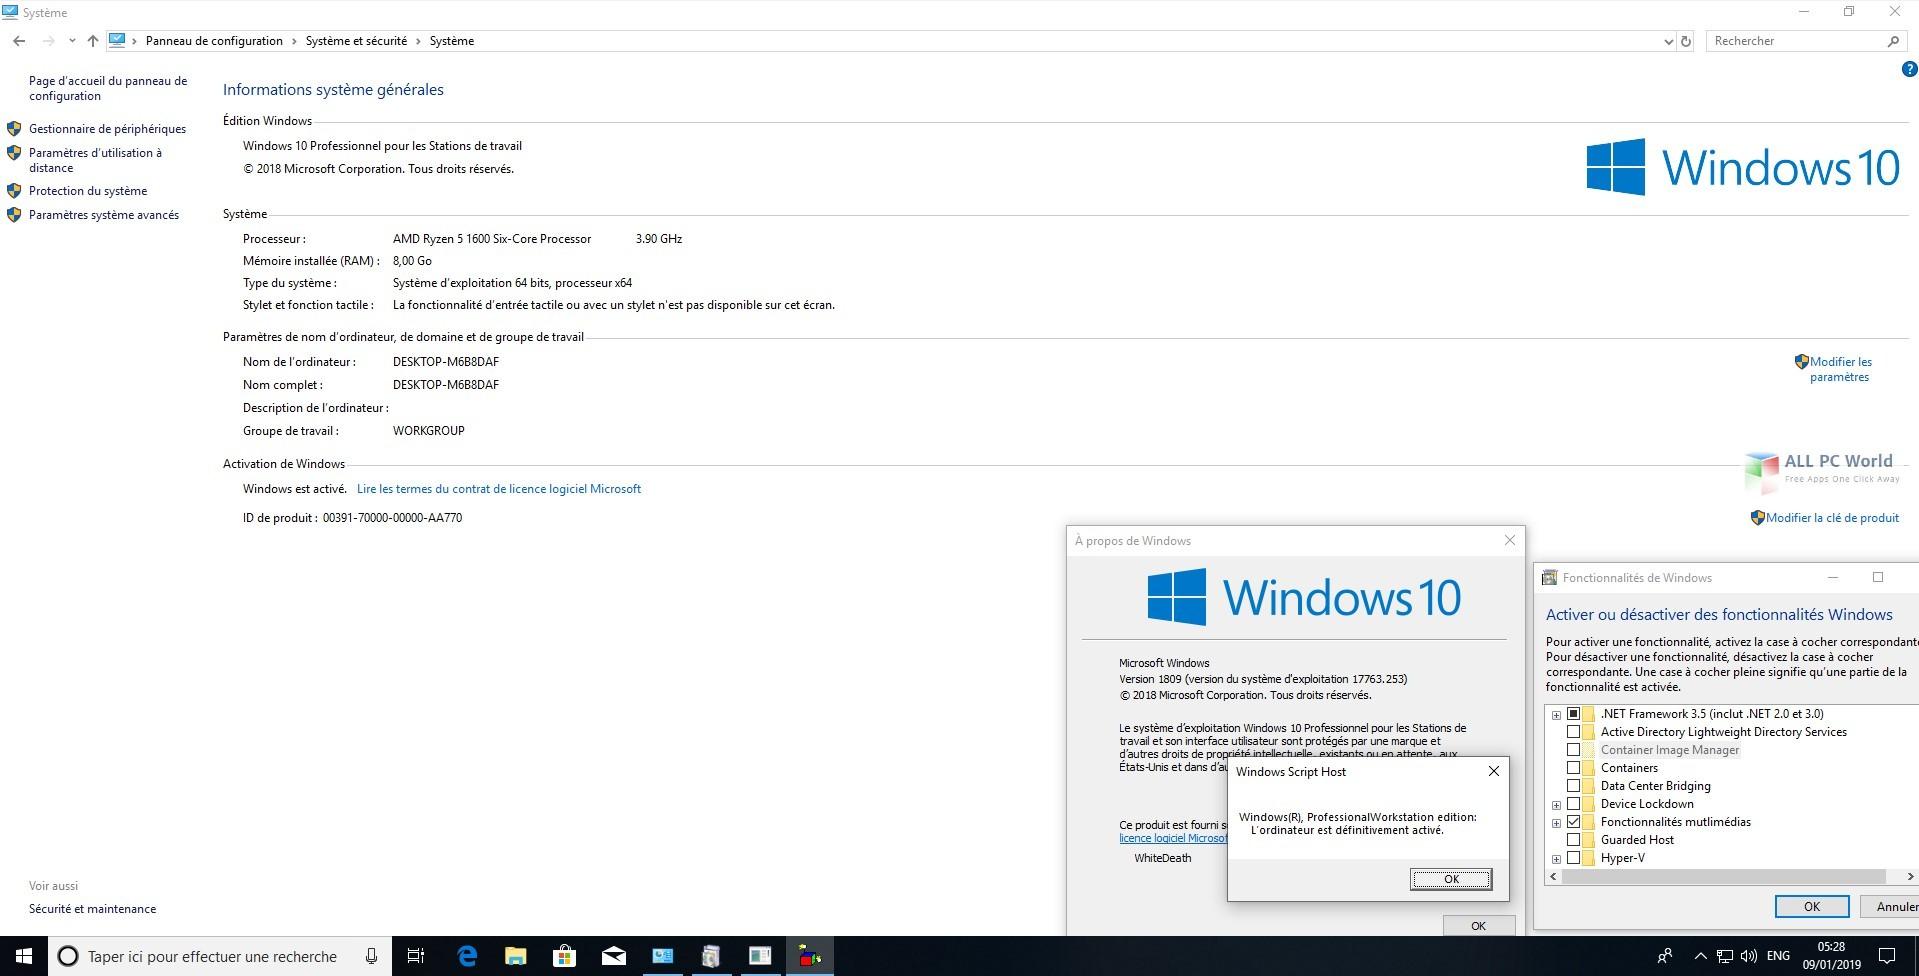 Windows 10 RS5 AIO with January 2019